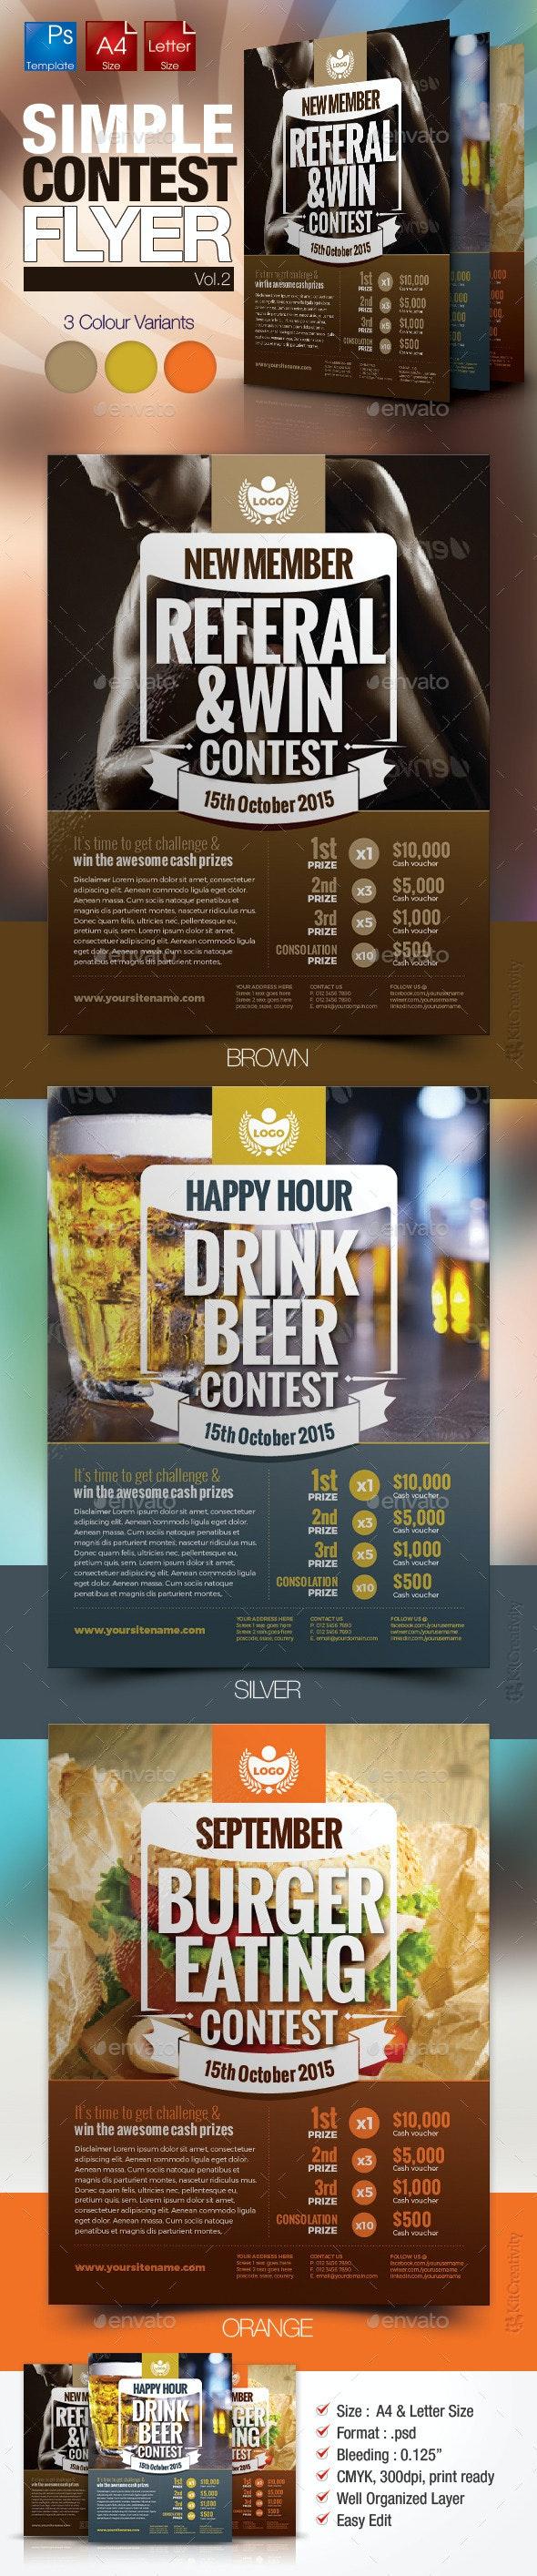 Simple Contest Flyer Vol.02 - Miscellaneous Events